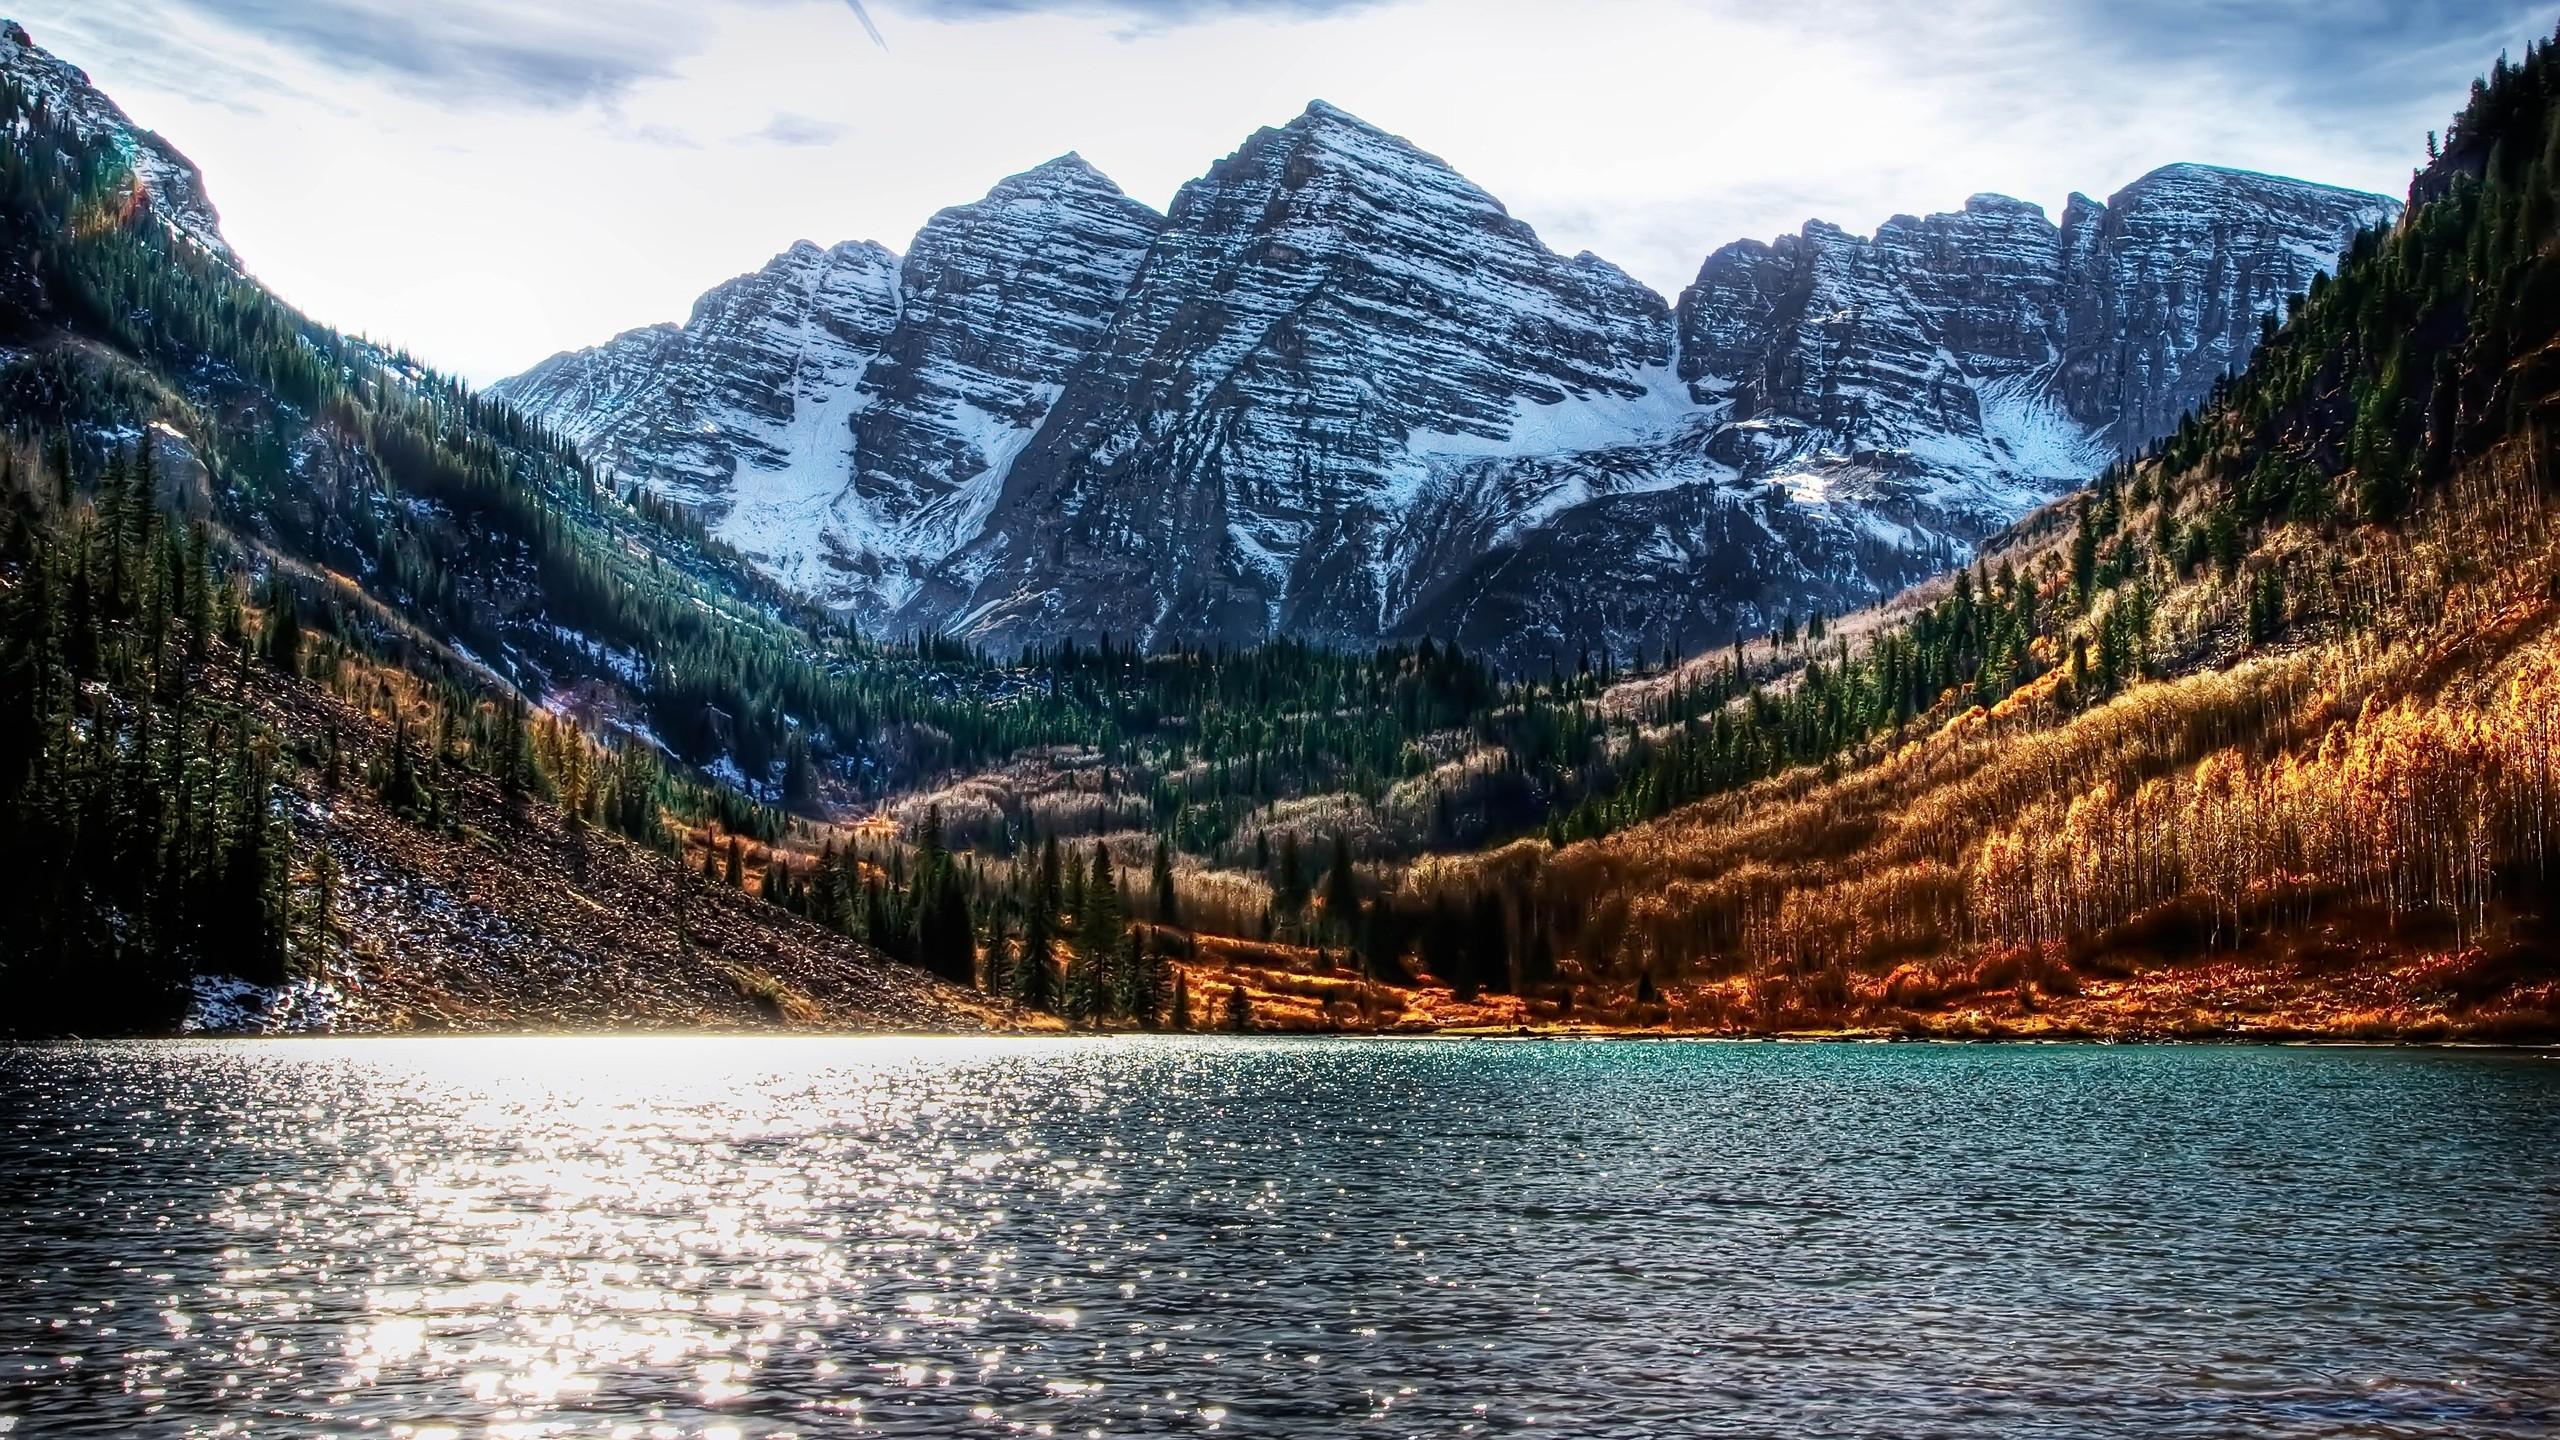 Colorado lakes HDR photography brightness Maroon Bells wallpaper 2560x1440